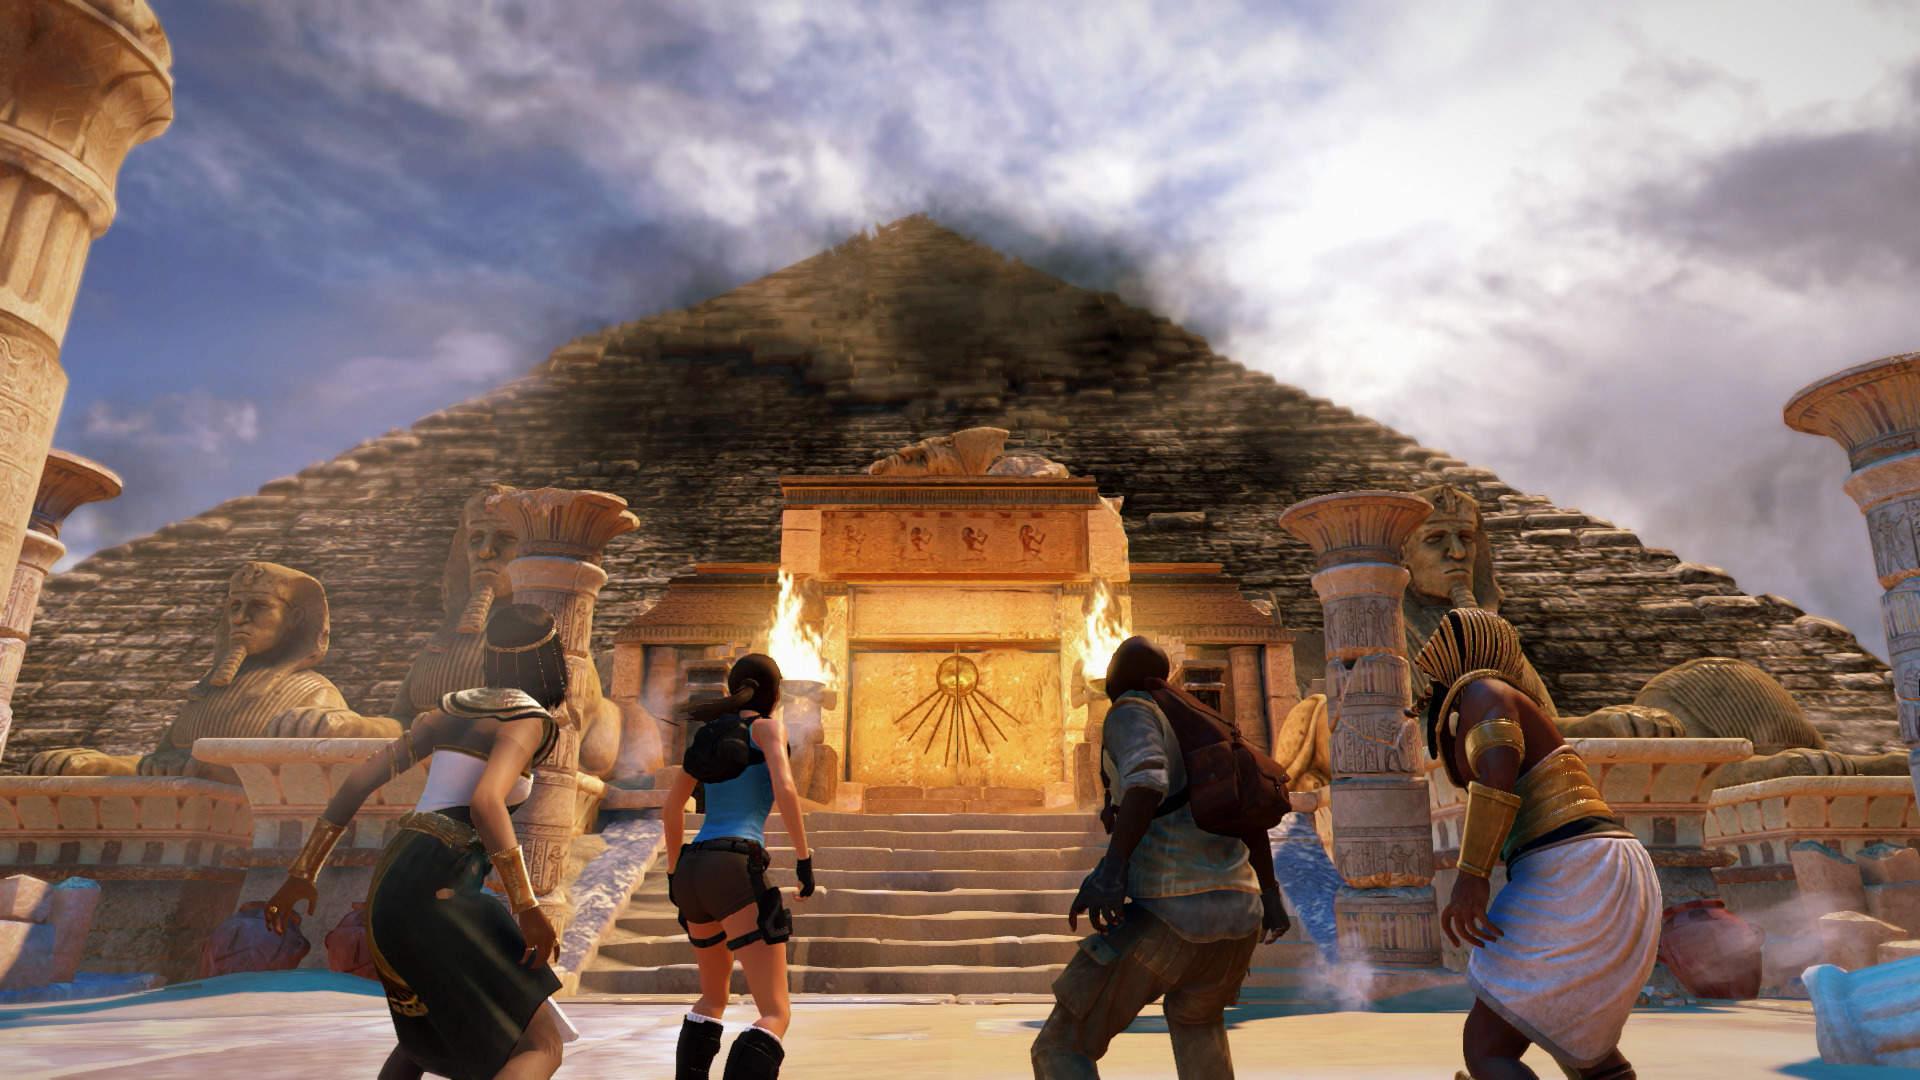 Temple of Osiris